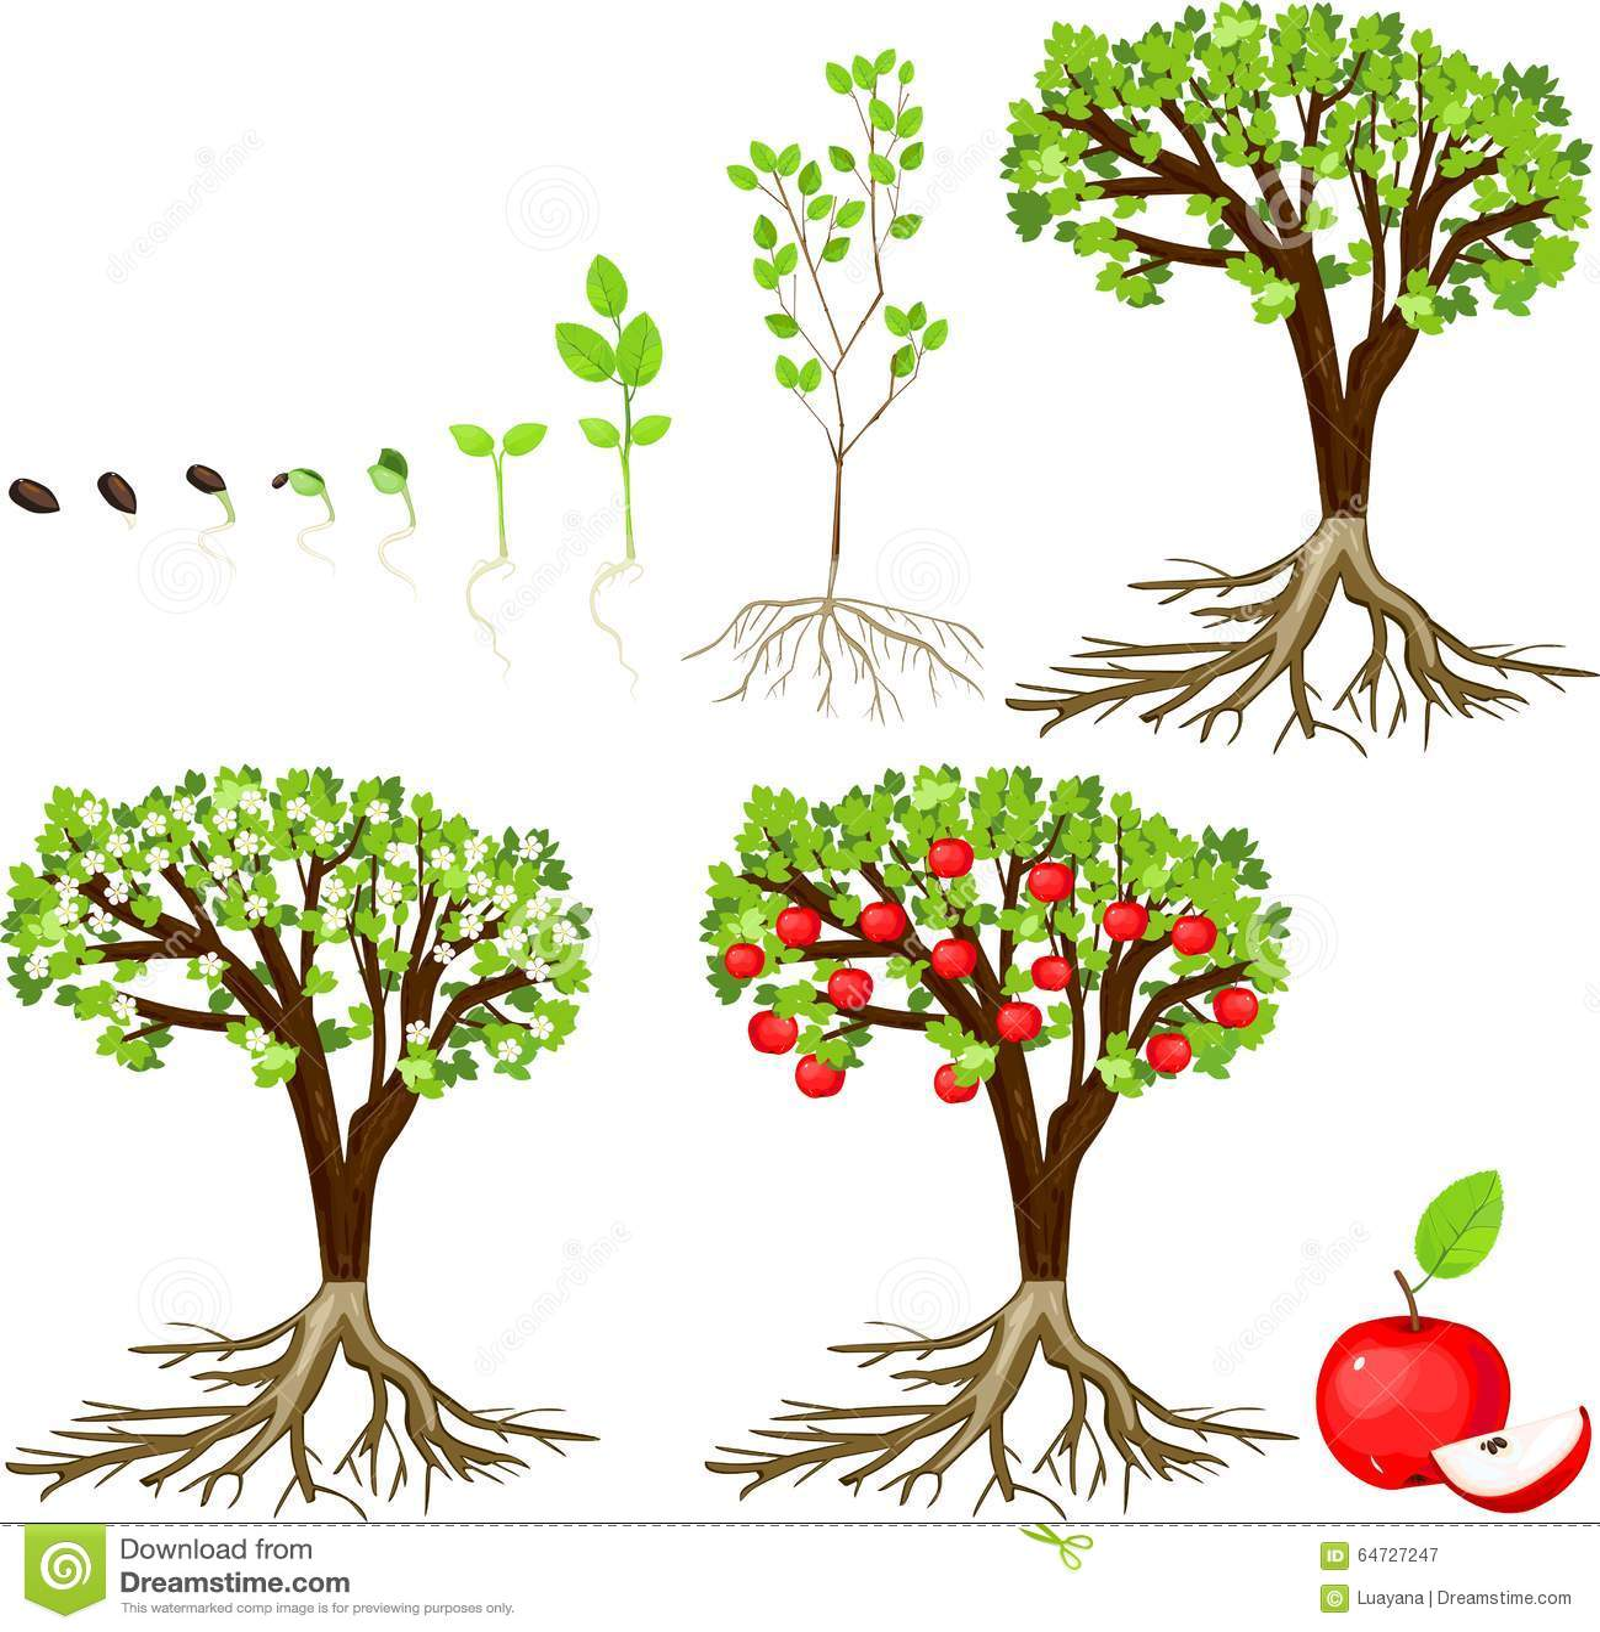 Lebenszyklus Des Apfelbaums Vektor Abbildung